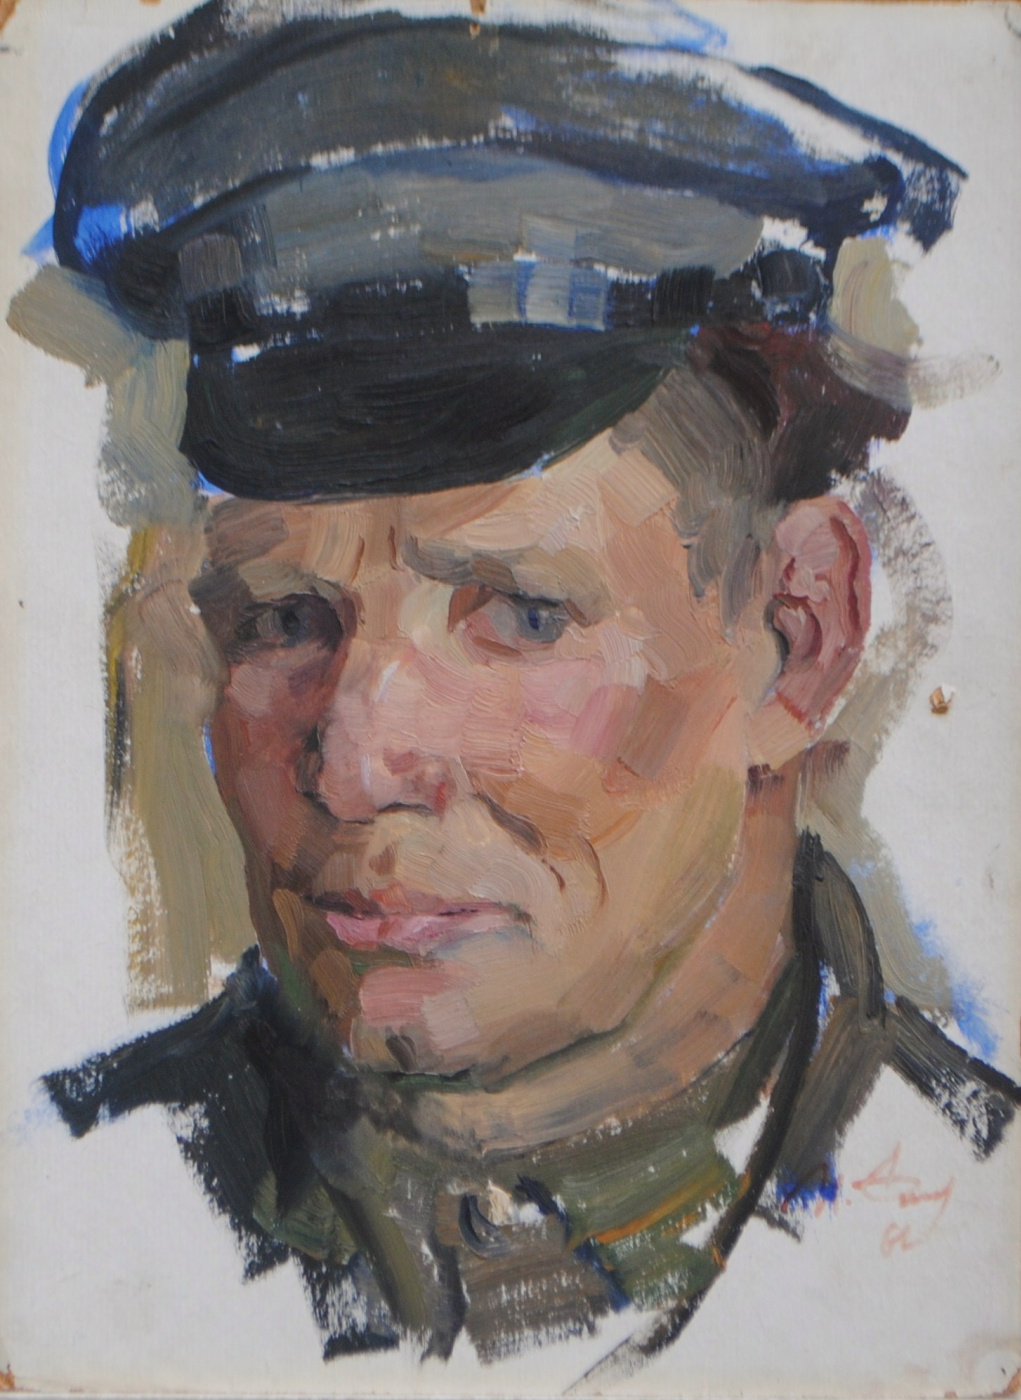 Ivan Ivanovich Filichev. Worker Kedrovsky section